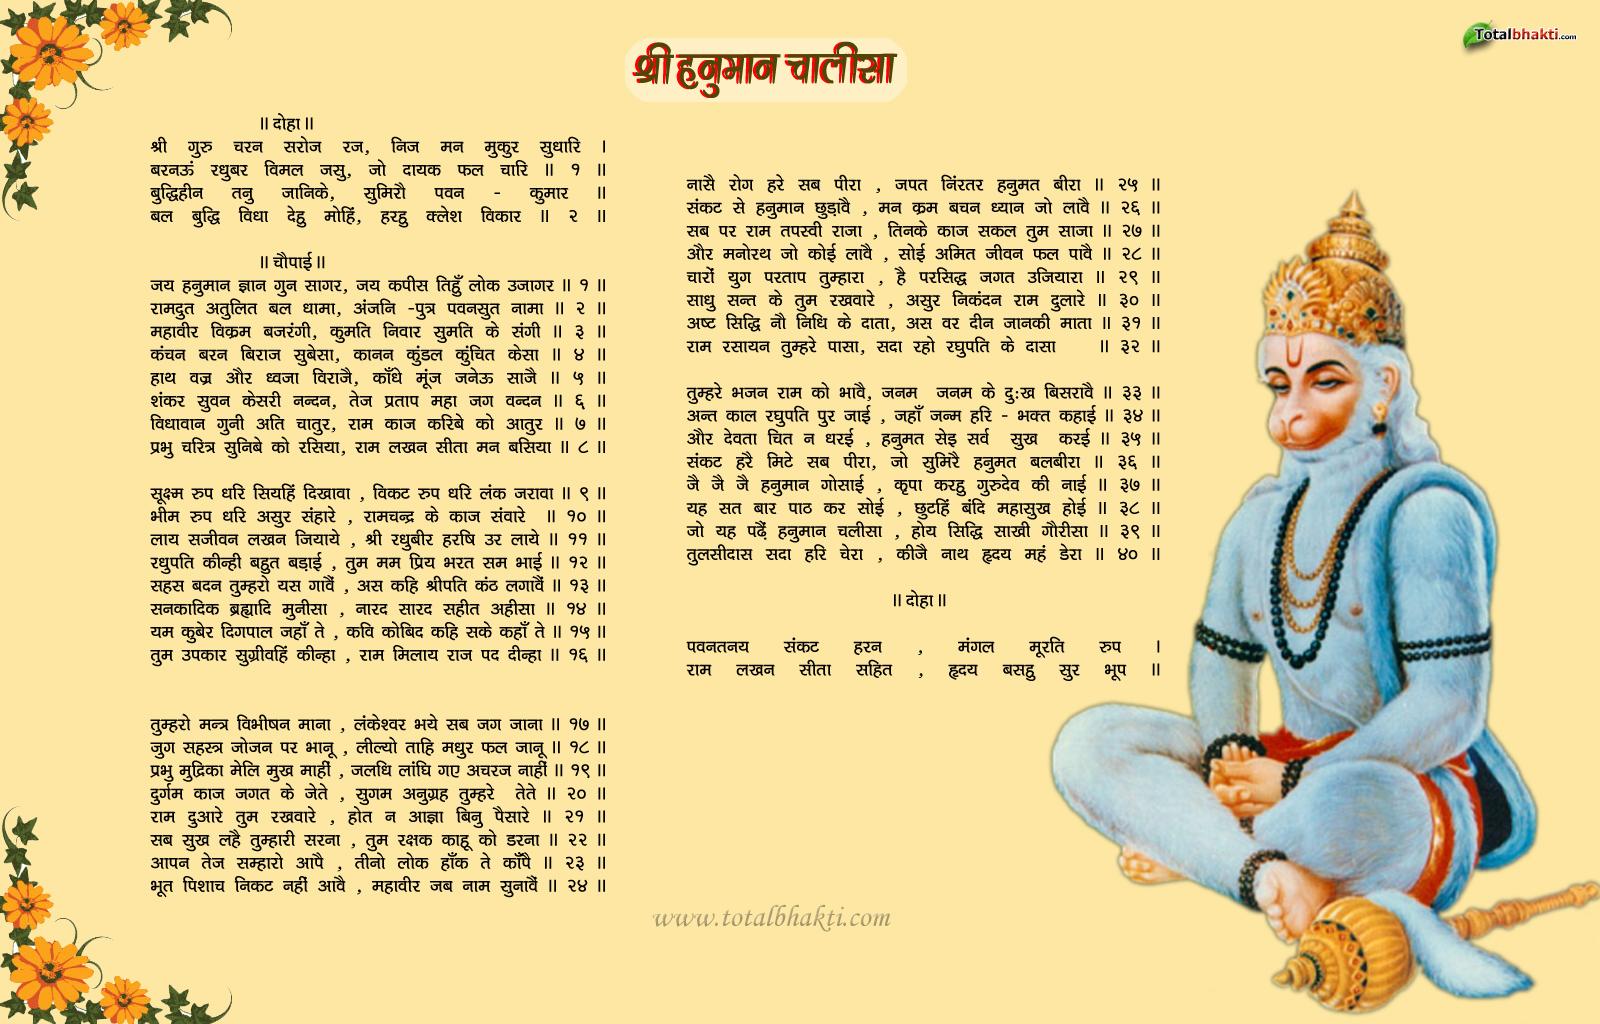 http://3.bp.blogspot.com/-bRzbWaHkjEM/UB5KPlwA9KI/AAAAAAAAAHg/4GGEaQCmkMk/s1600/Hanuman-Chalisa-Wallpaper-1367.jpg